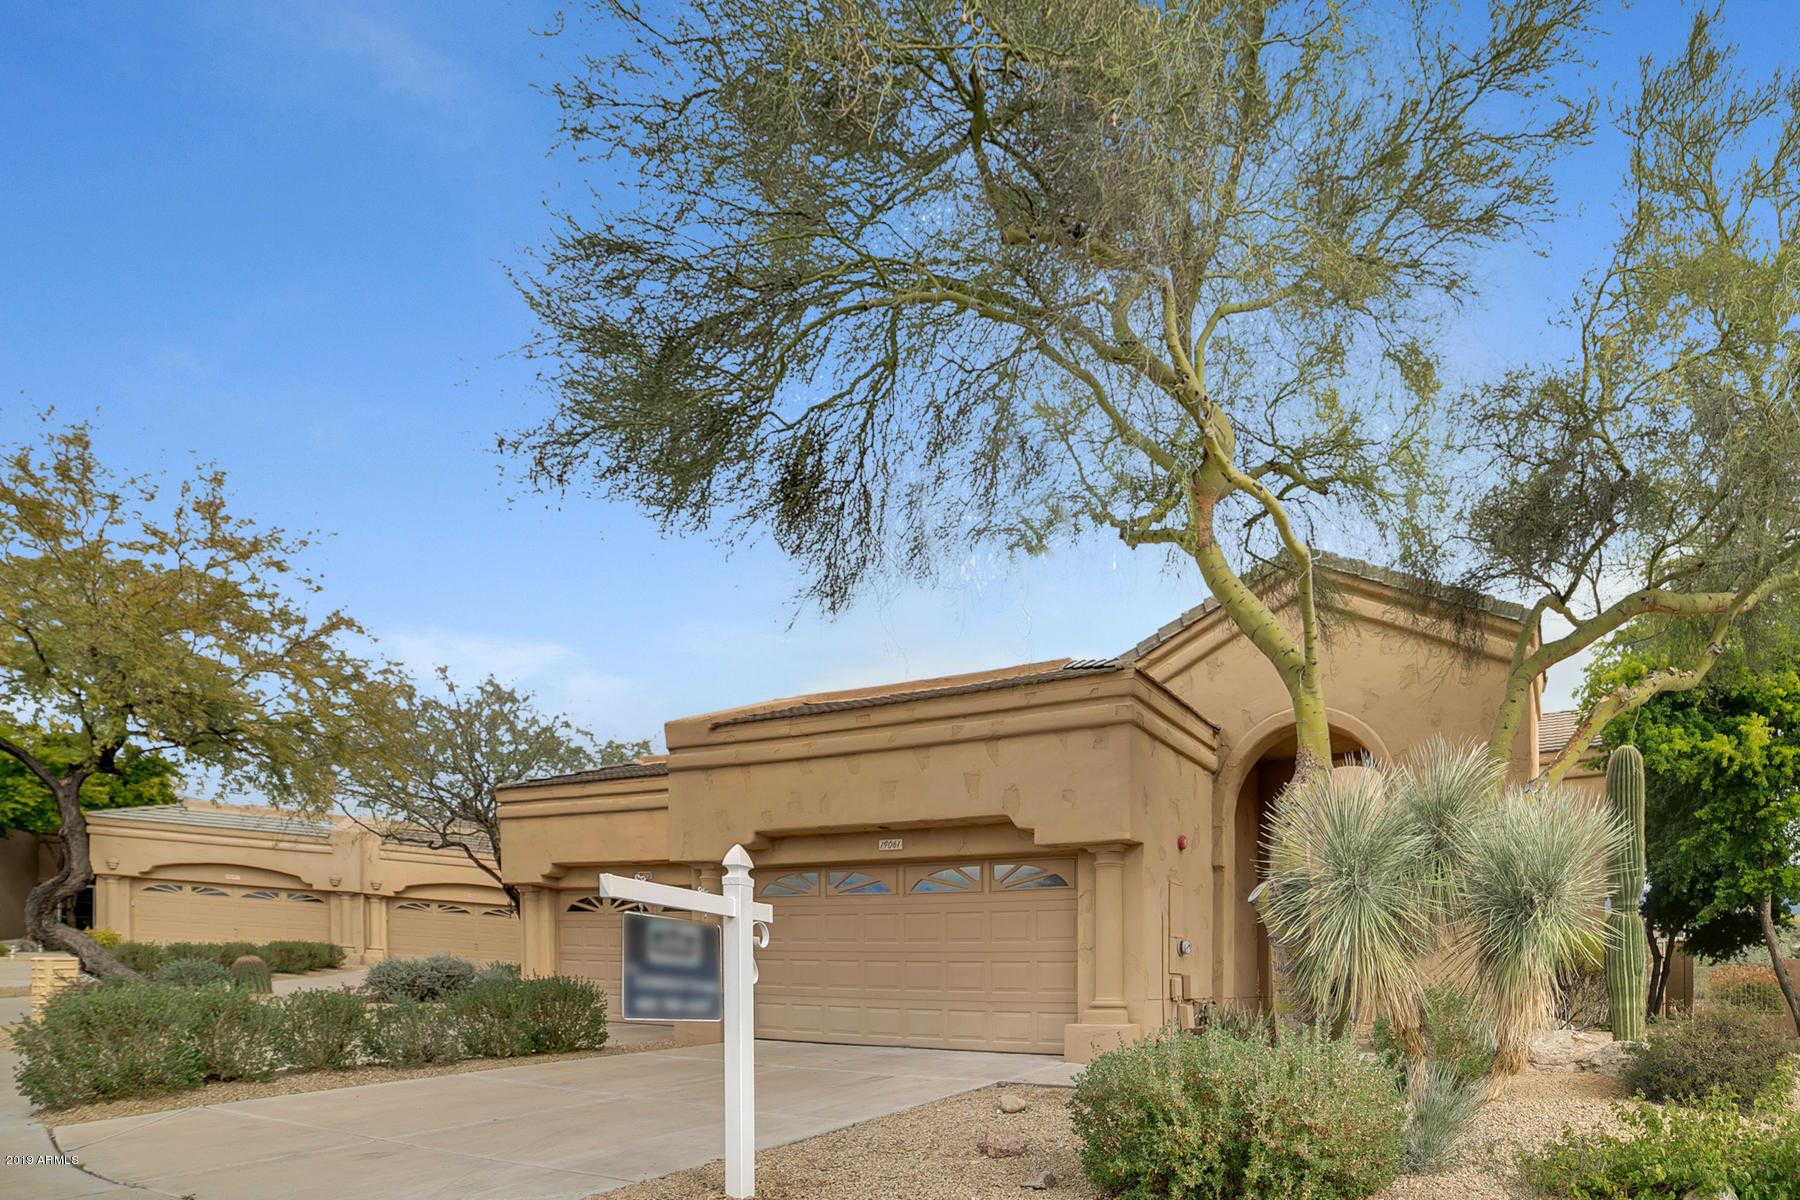 $380,000 - 2Br/2Ba -  for Sale in Ironwood Village Parcel 3 Lot 1-40 Tr A-d, Scottsdale